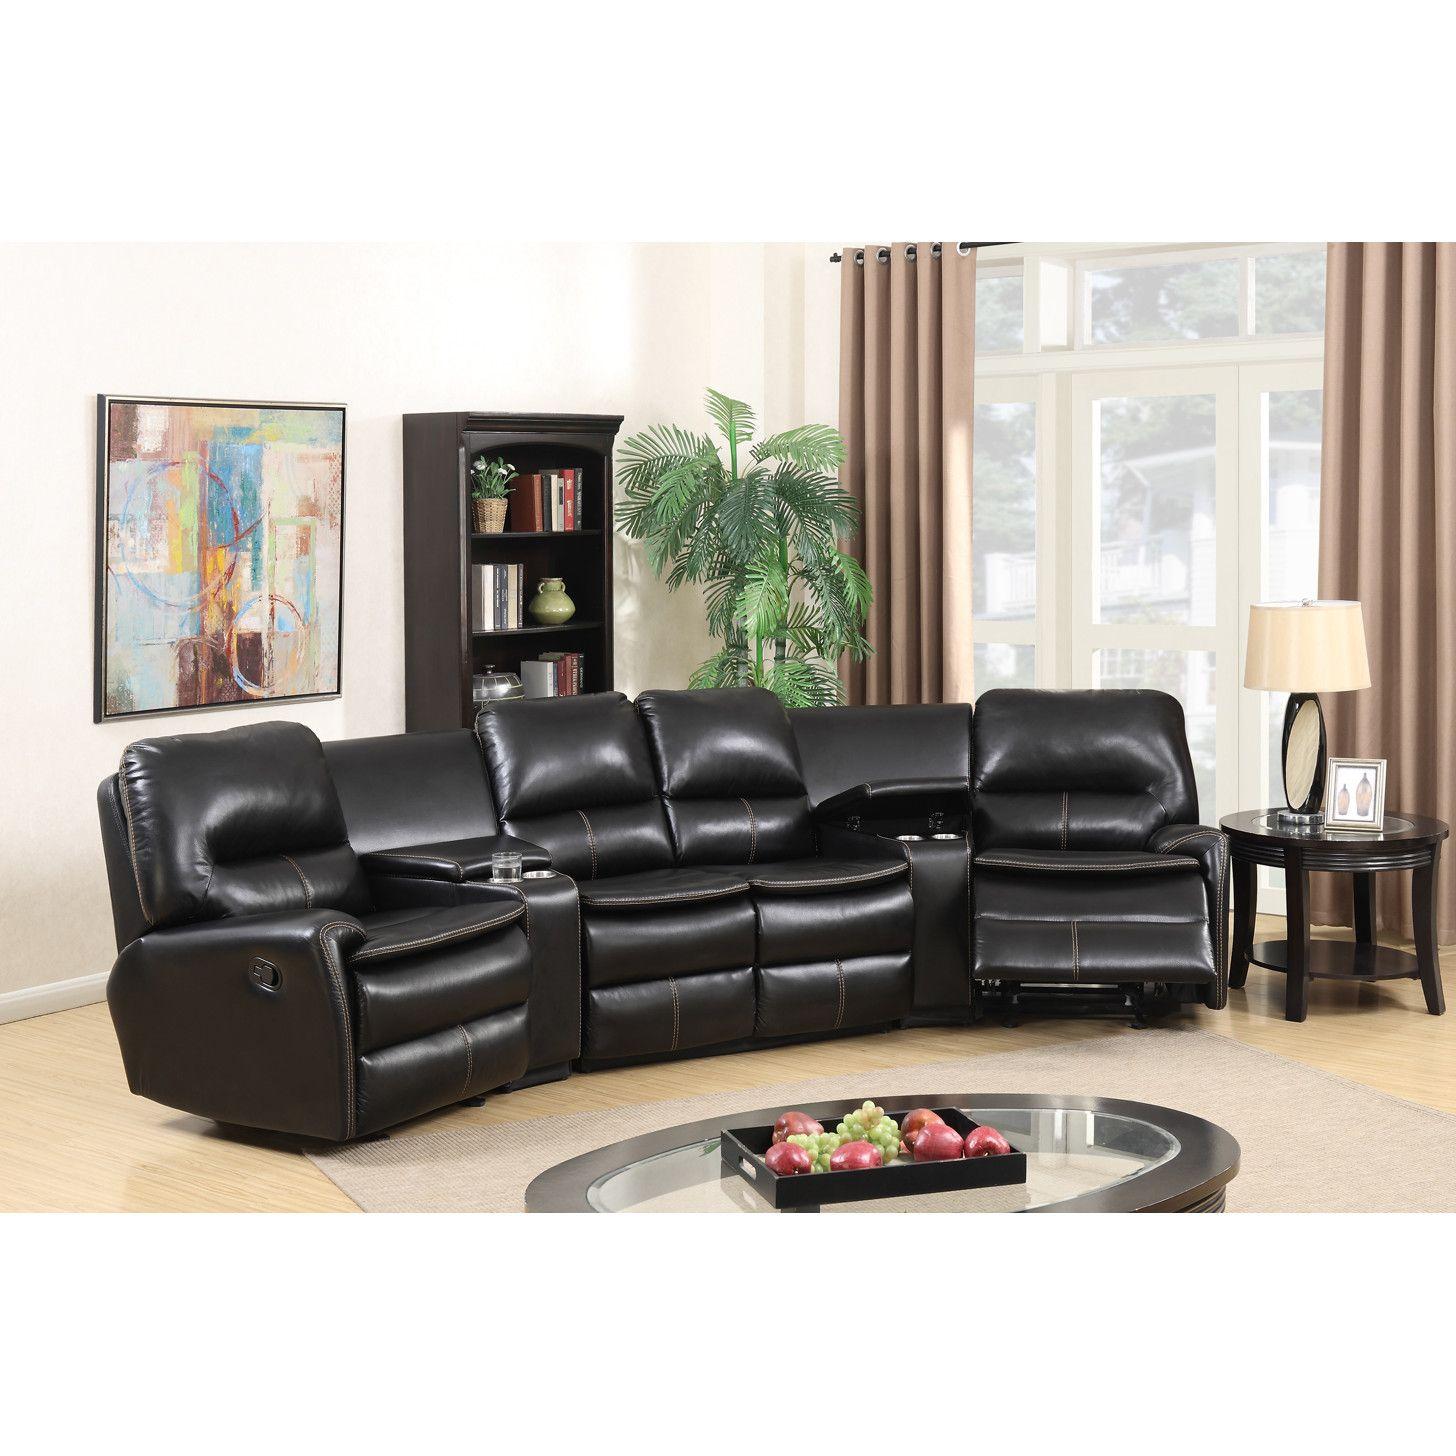 Sensational Yonkers Reclining Sectional Basement Leather Reclining Short Links Chair Design For Home Short Linksinfo